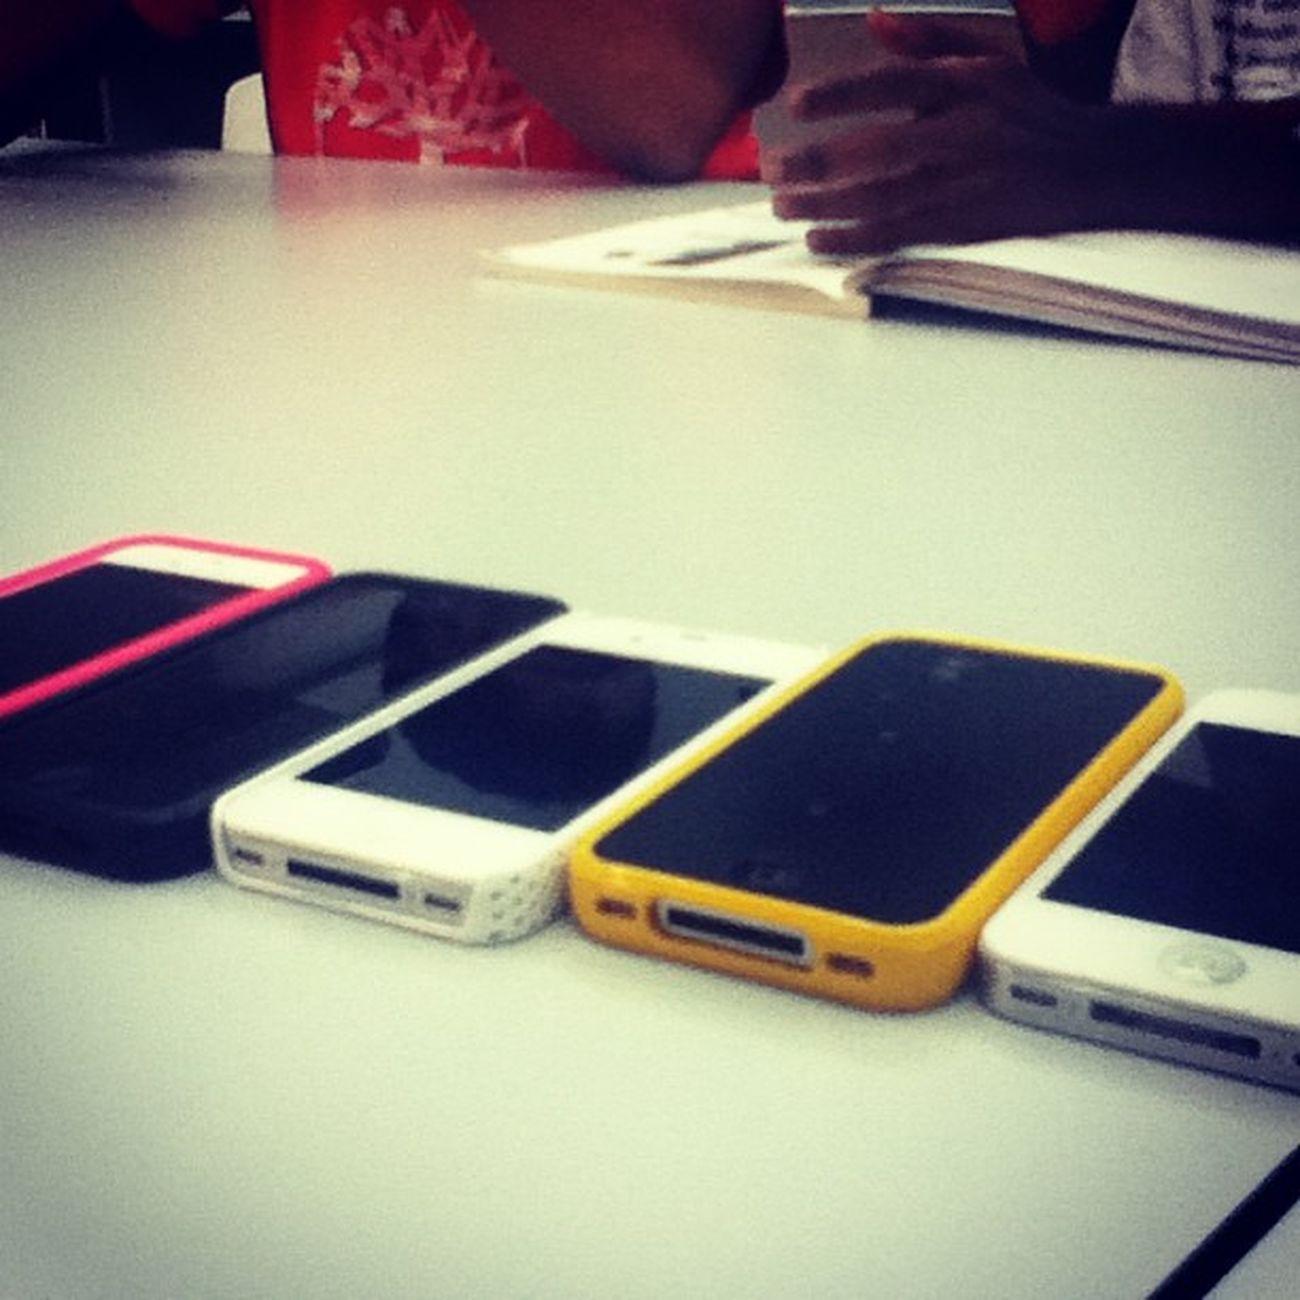 The Apple family @sundradevan @jlicekoh @shaunneeyyy @azrielaziz